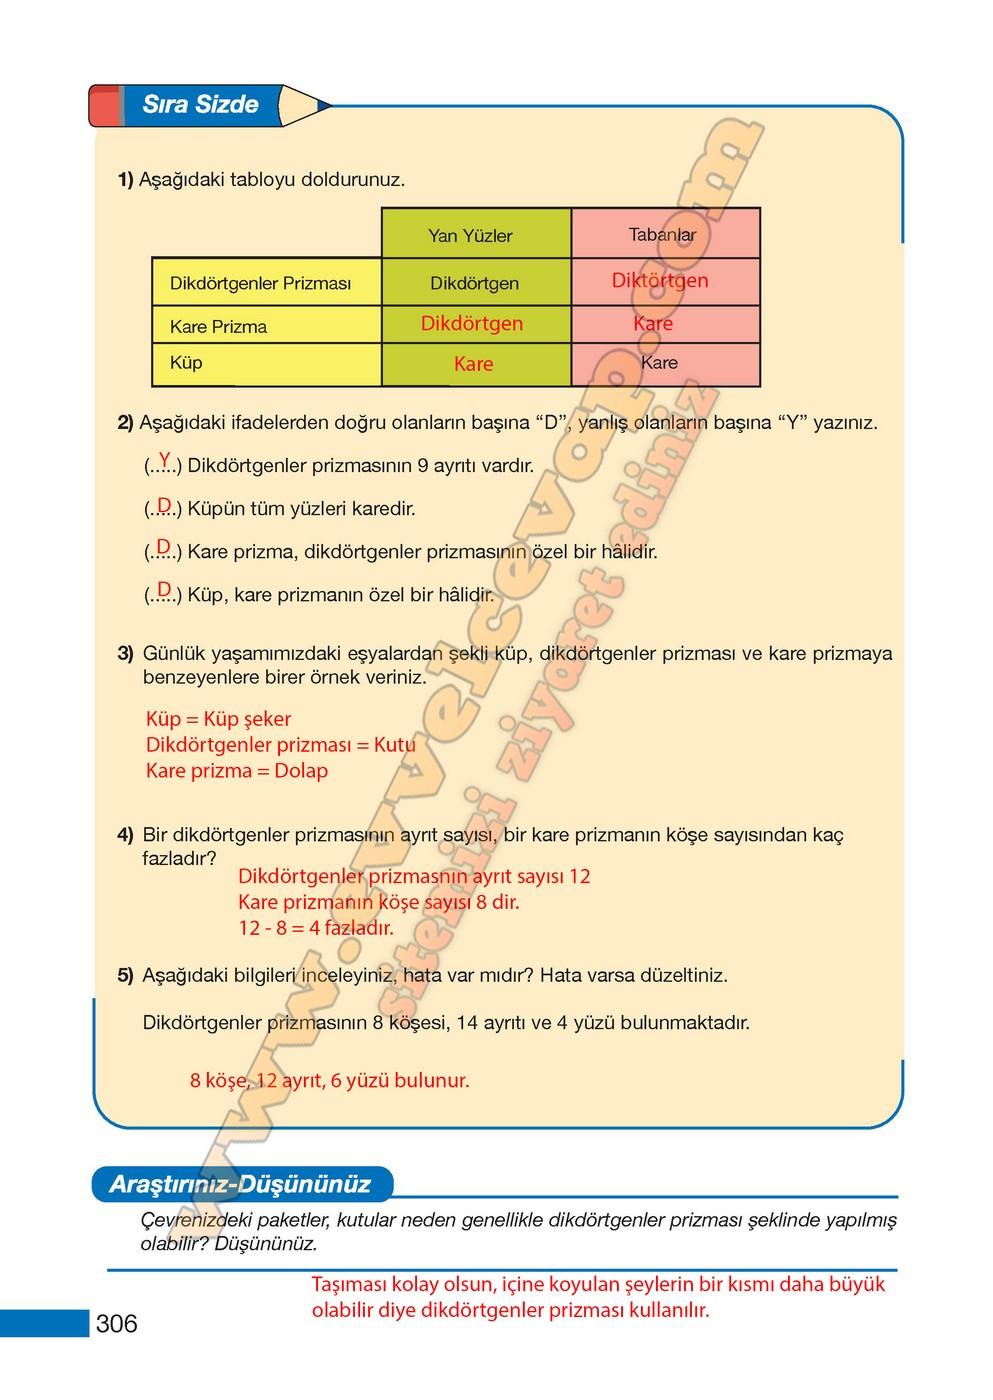 5 Sinif Meb Yayinlari Matematik Ders Kitabi Sayfa 306 Cevaplari